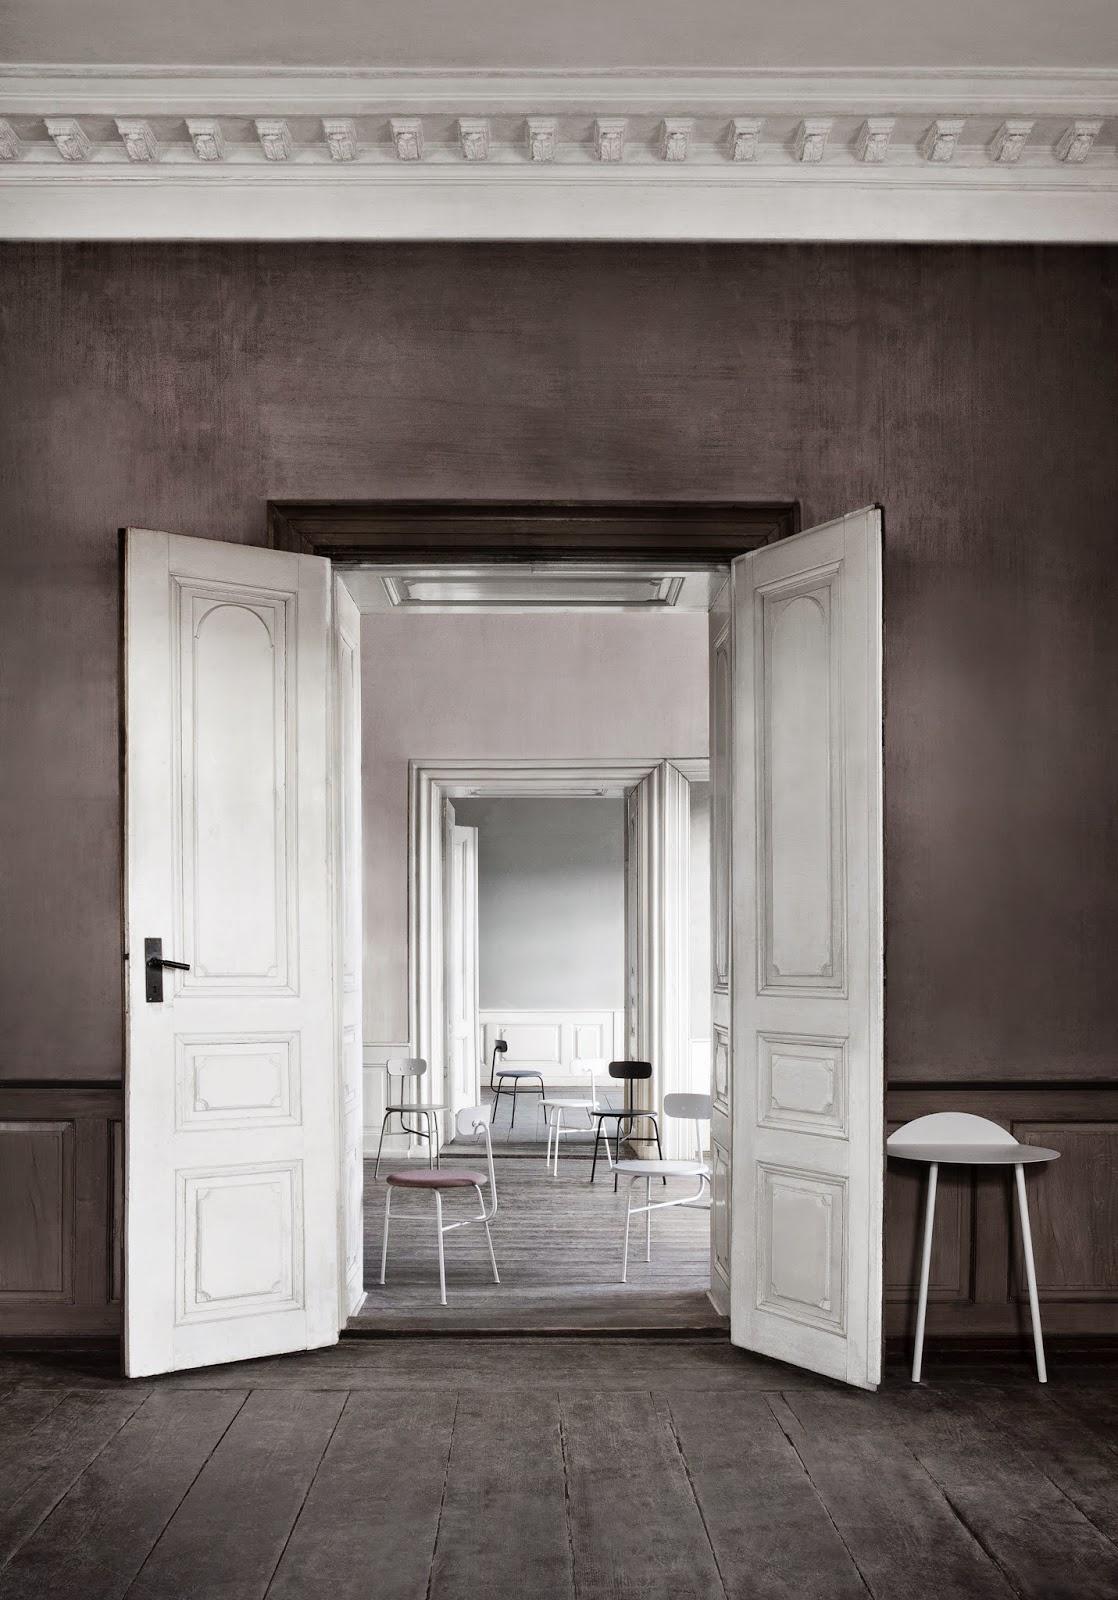 scandinese, scandinavian, japanese interior design, decor8, menu via www.scandinavianlovesong.com